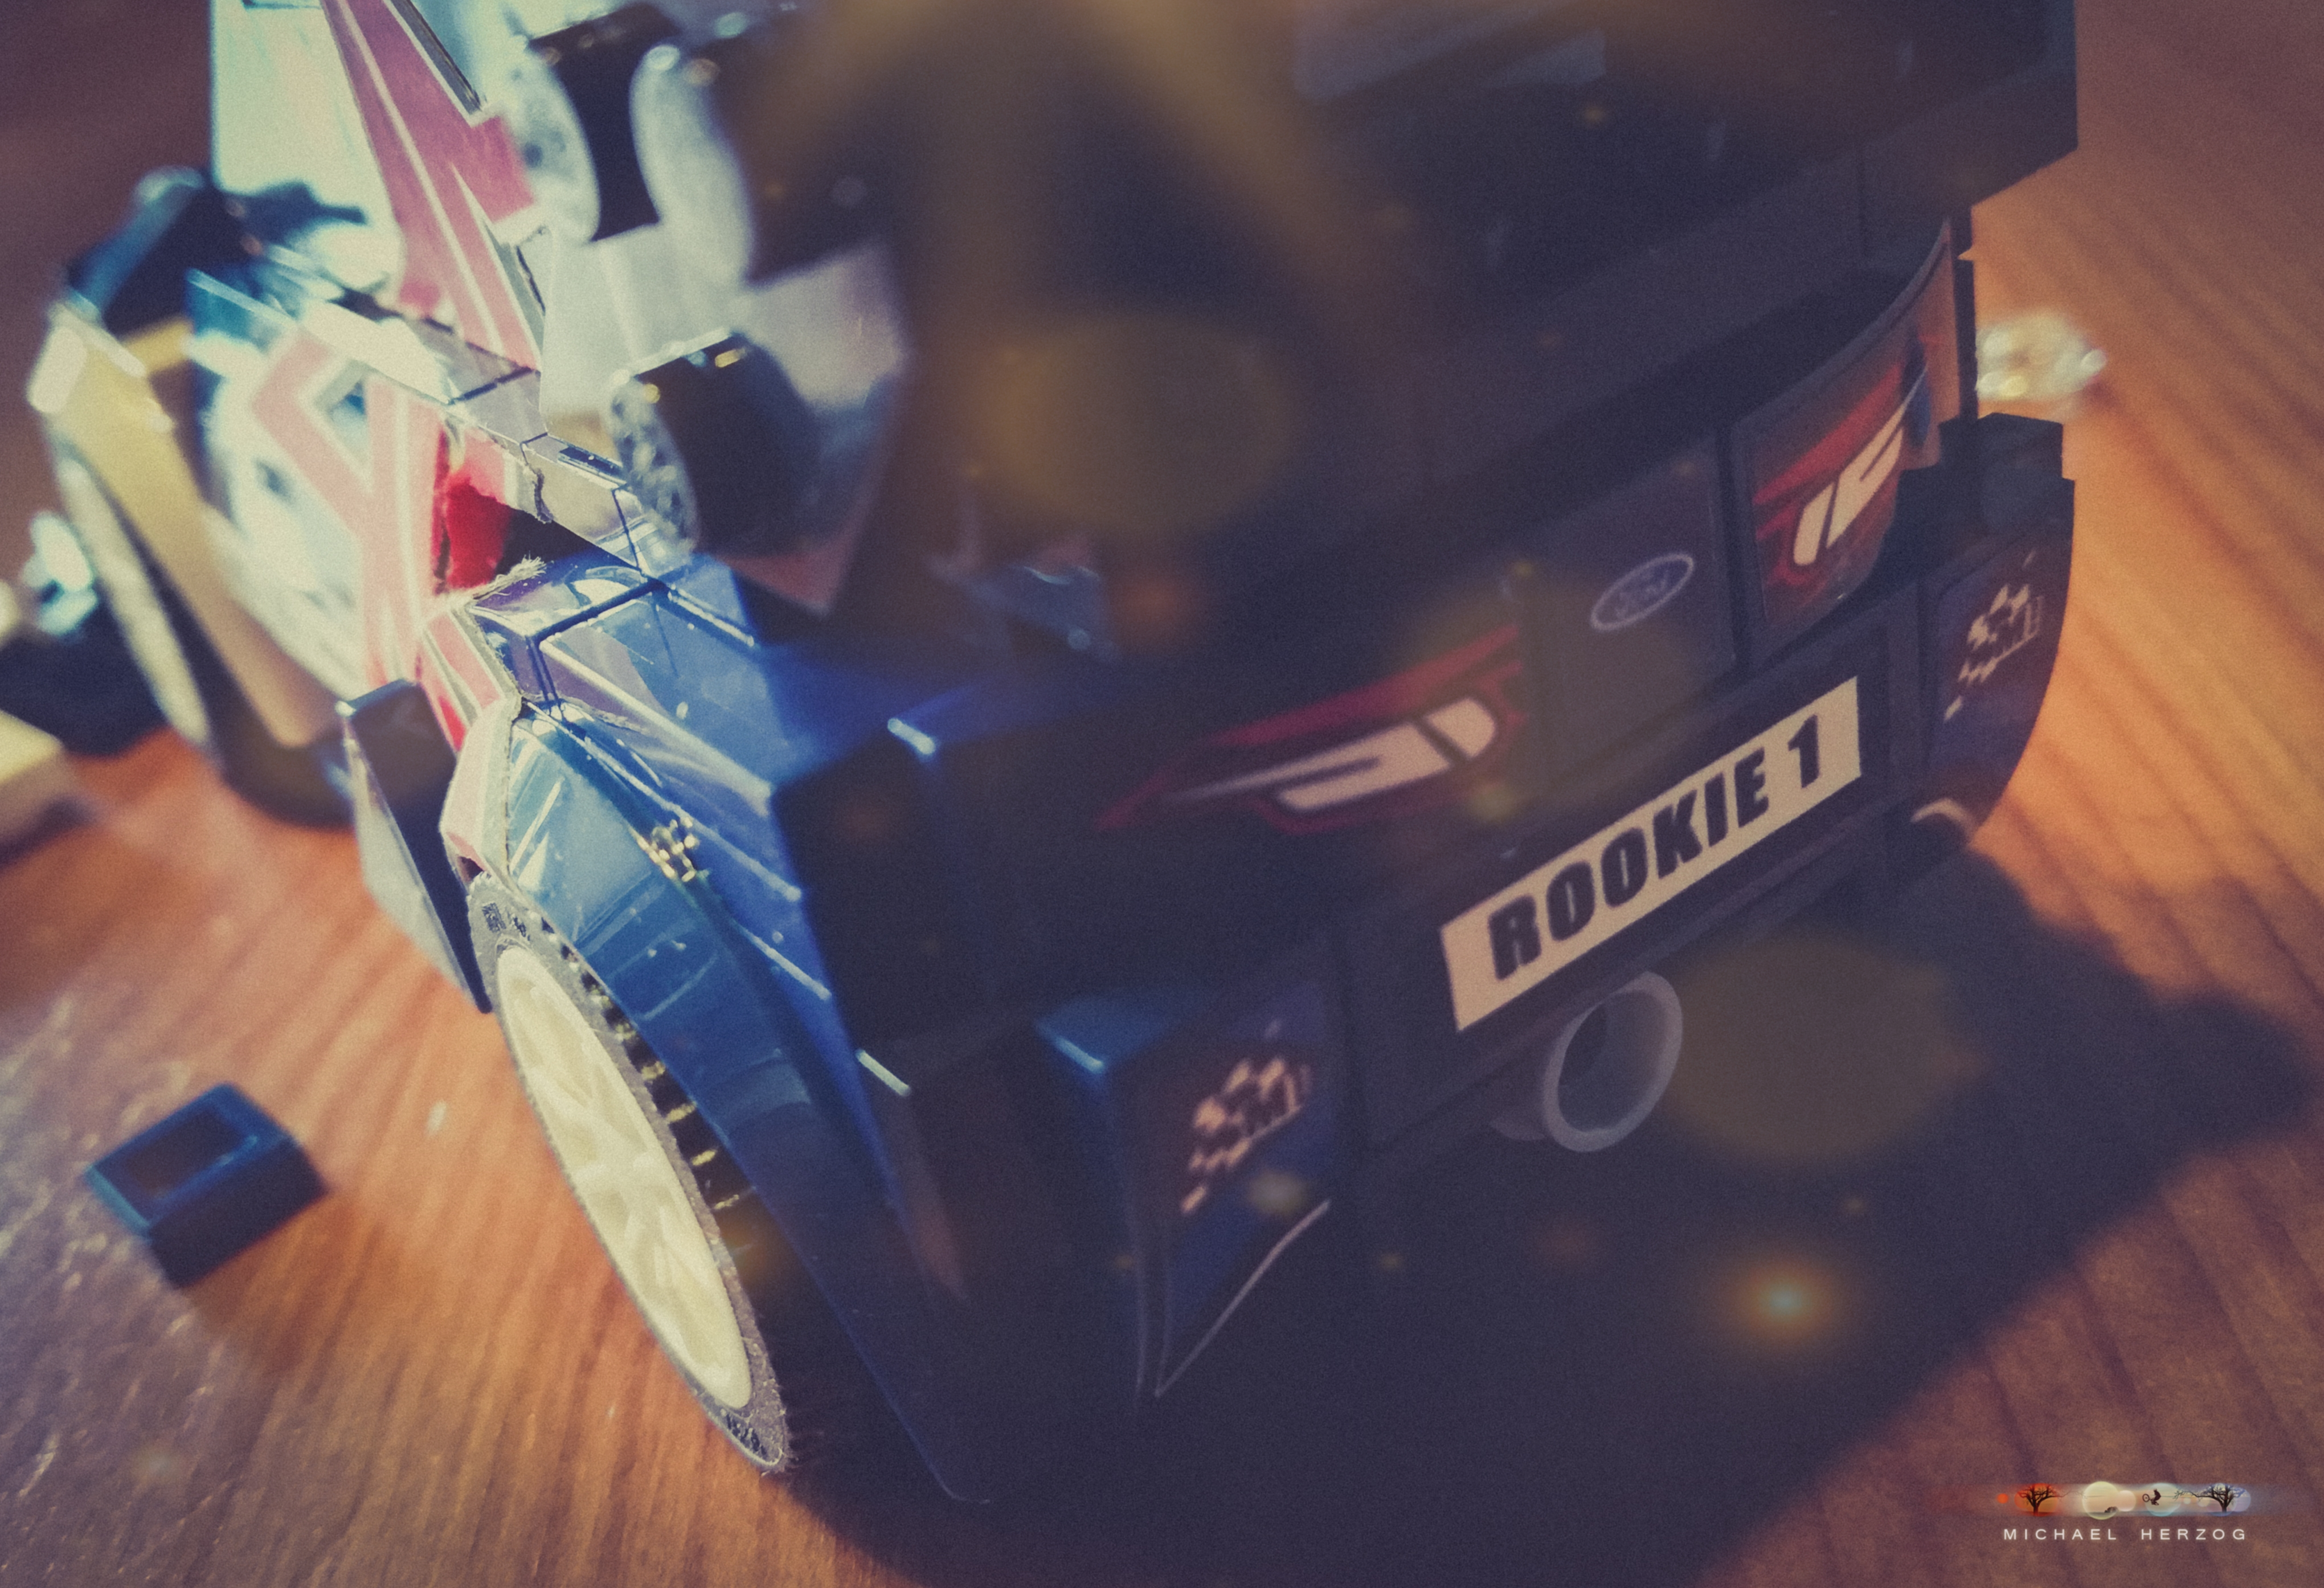 RacingRookie2019_Lego-Ford-Fiesta_Speedchampion_RookieEdition_AUTrenalinStudios-04.jpg